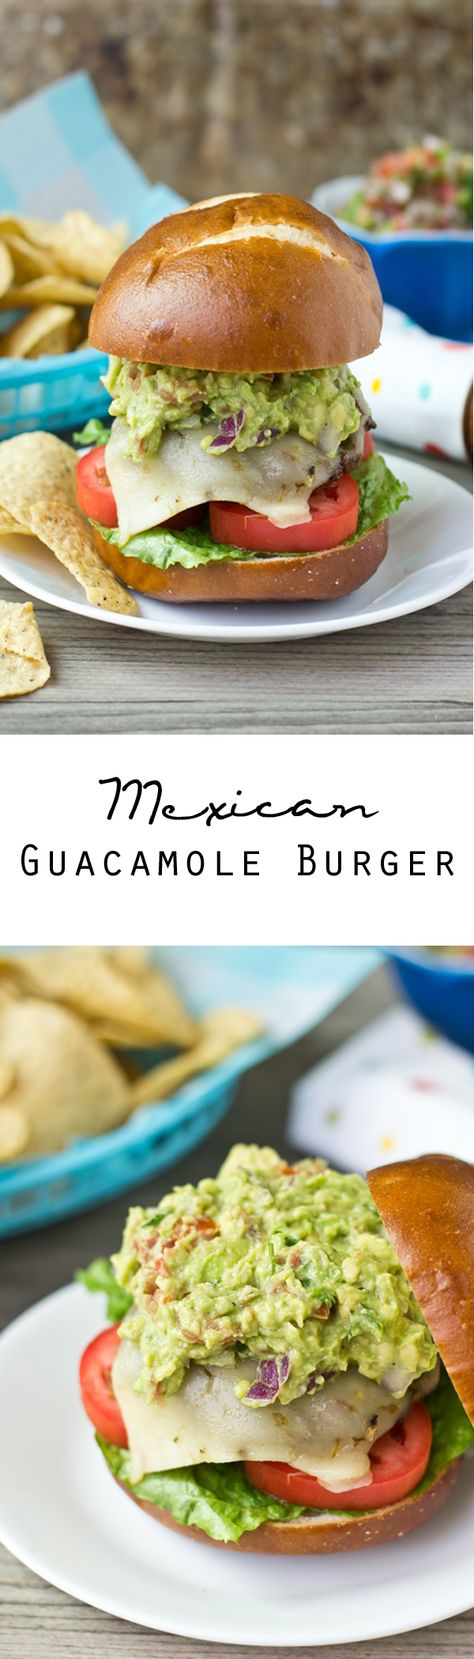 Mexican Guacamole Burgers on MyRecipeMagic.com. If you love guacamole, you'll love these Mexican Guacamole Burgers. They've got Mexican seasoning baked inside and homemade guacamole on top! Read more at http://myrecipemagic.com/recipe/recipedetail/mexican-guacamole-burgers#y7AdTwljswApY0Ky.99